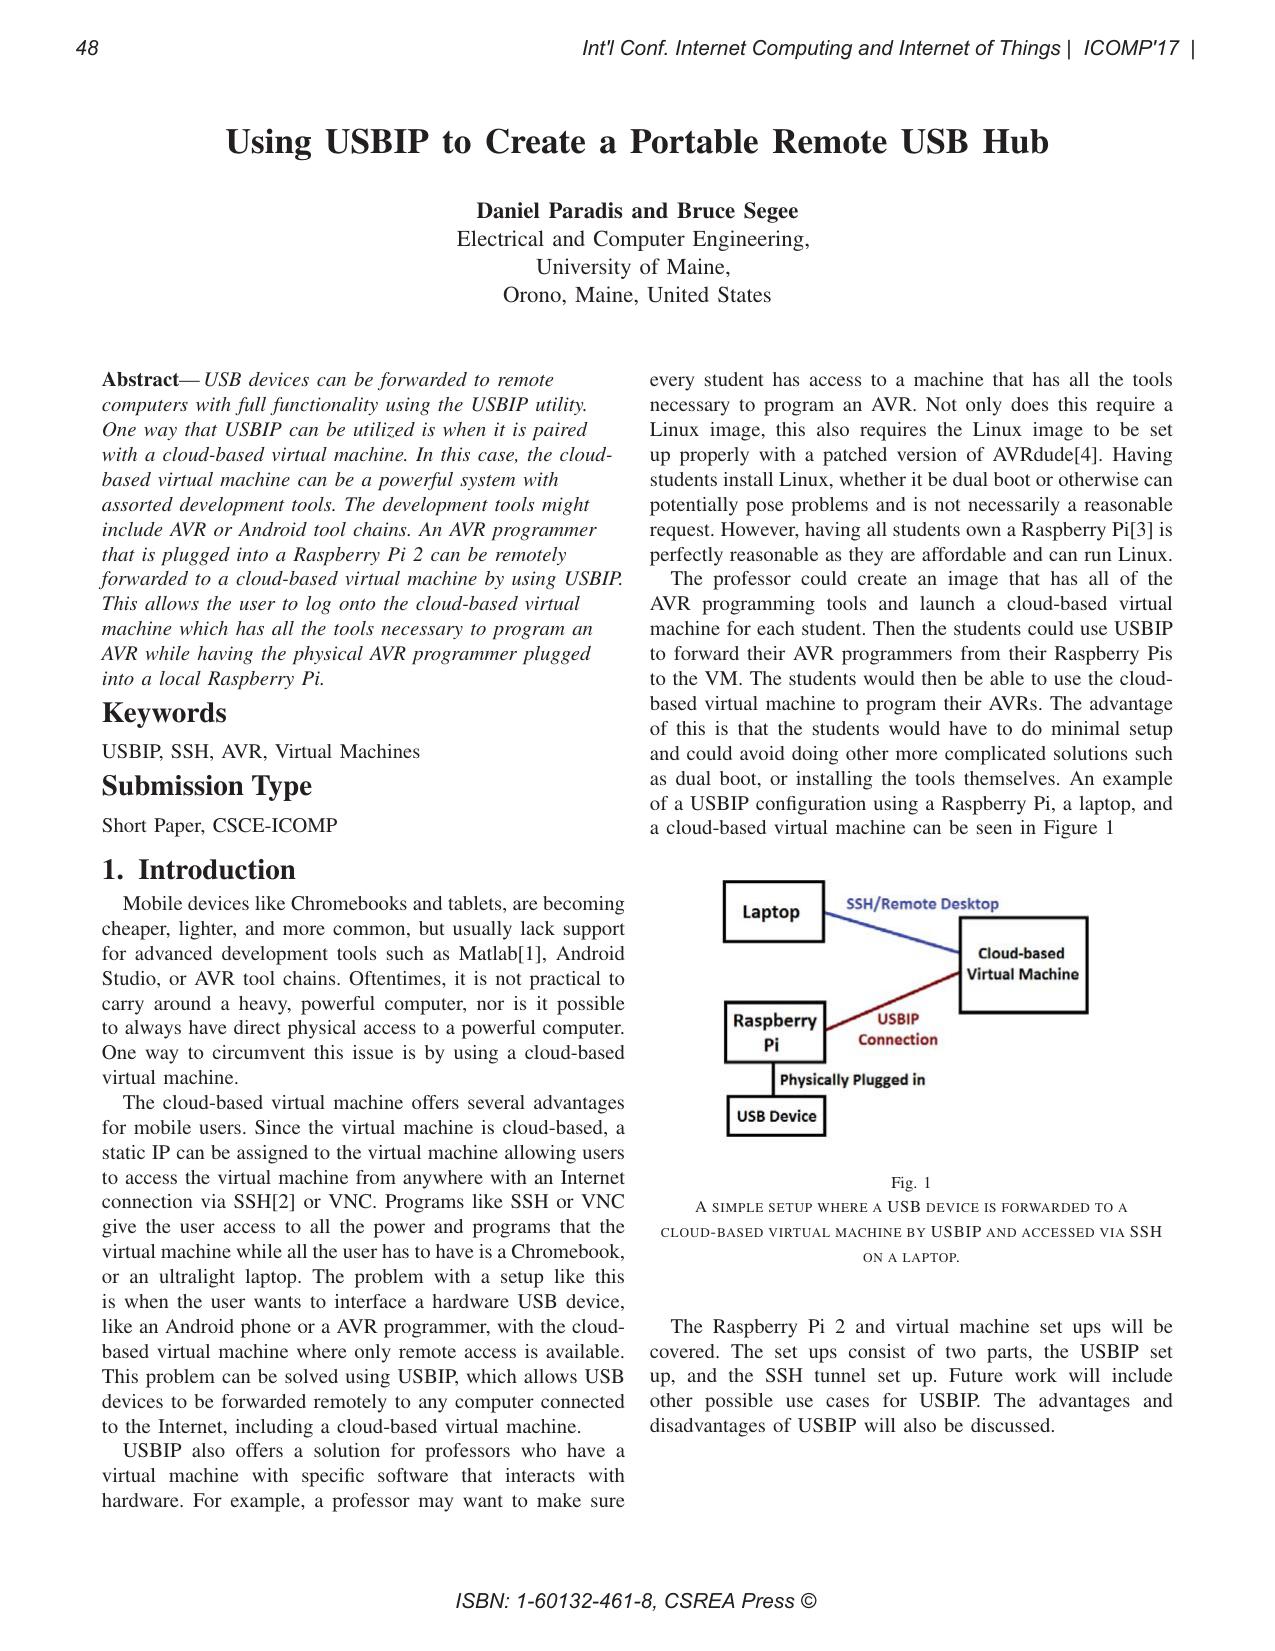 Using USBIP to Create a Portable Remote USB Hub | manualzz com